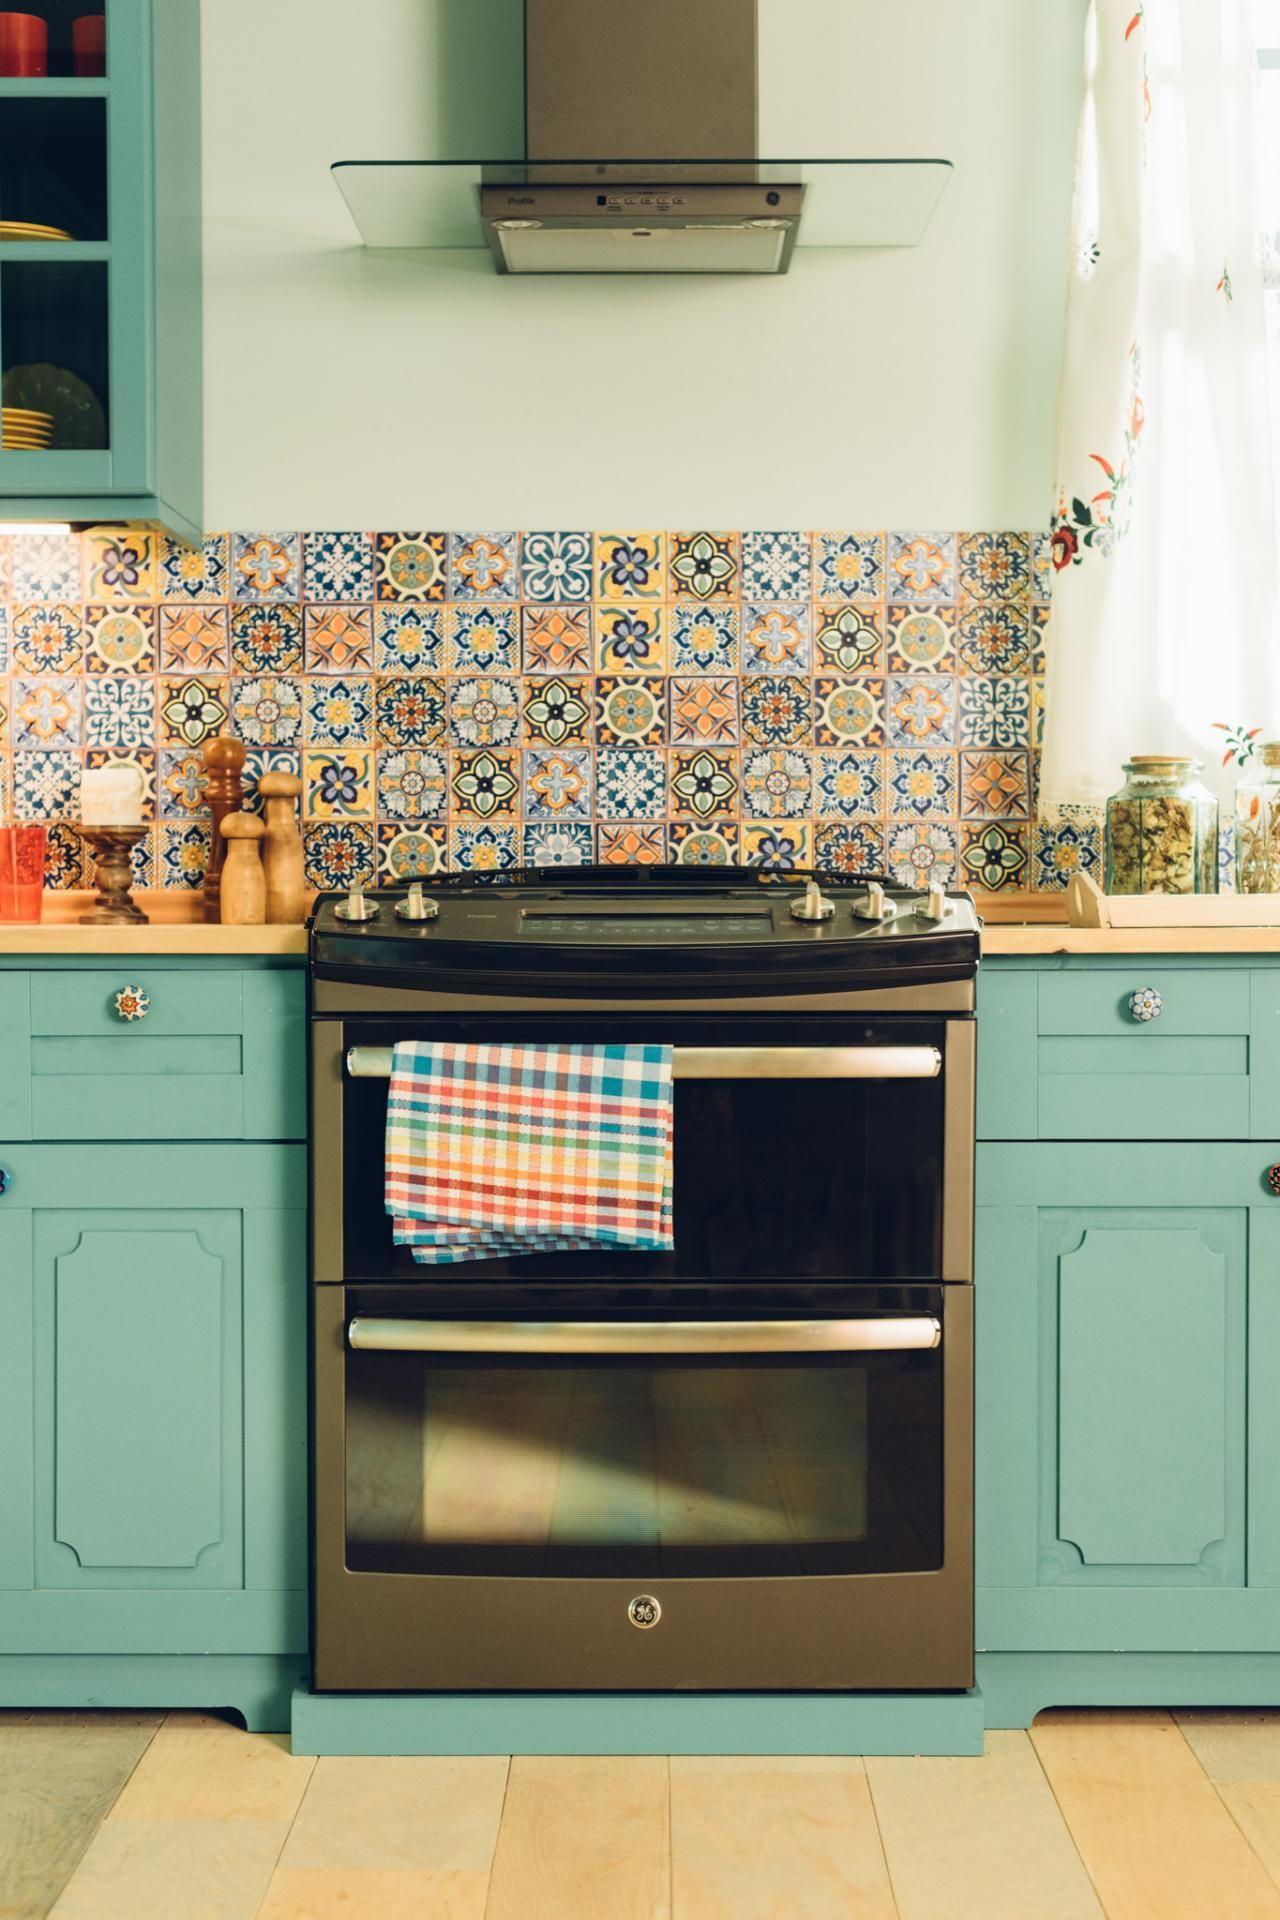 5 Easy Ways to Update Your Kitchen | Mosaic backsplash, Kitchens and ...